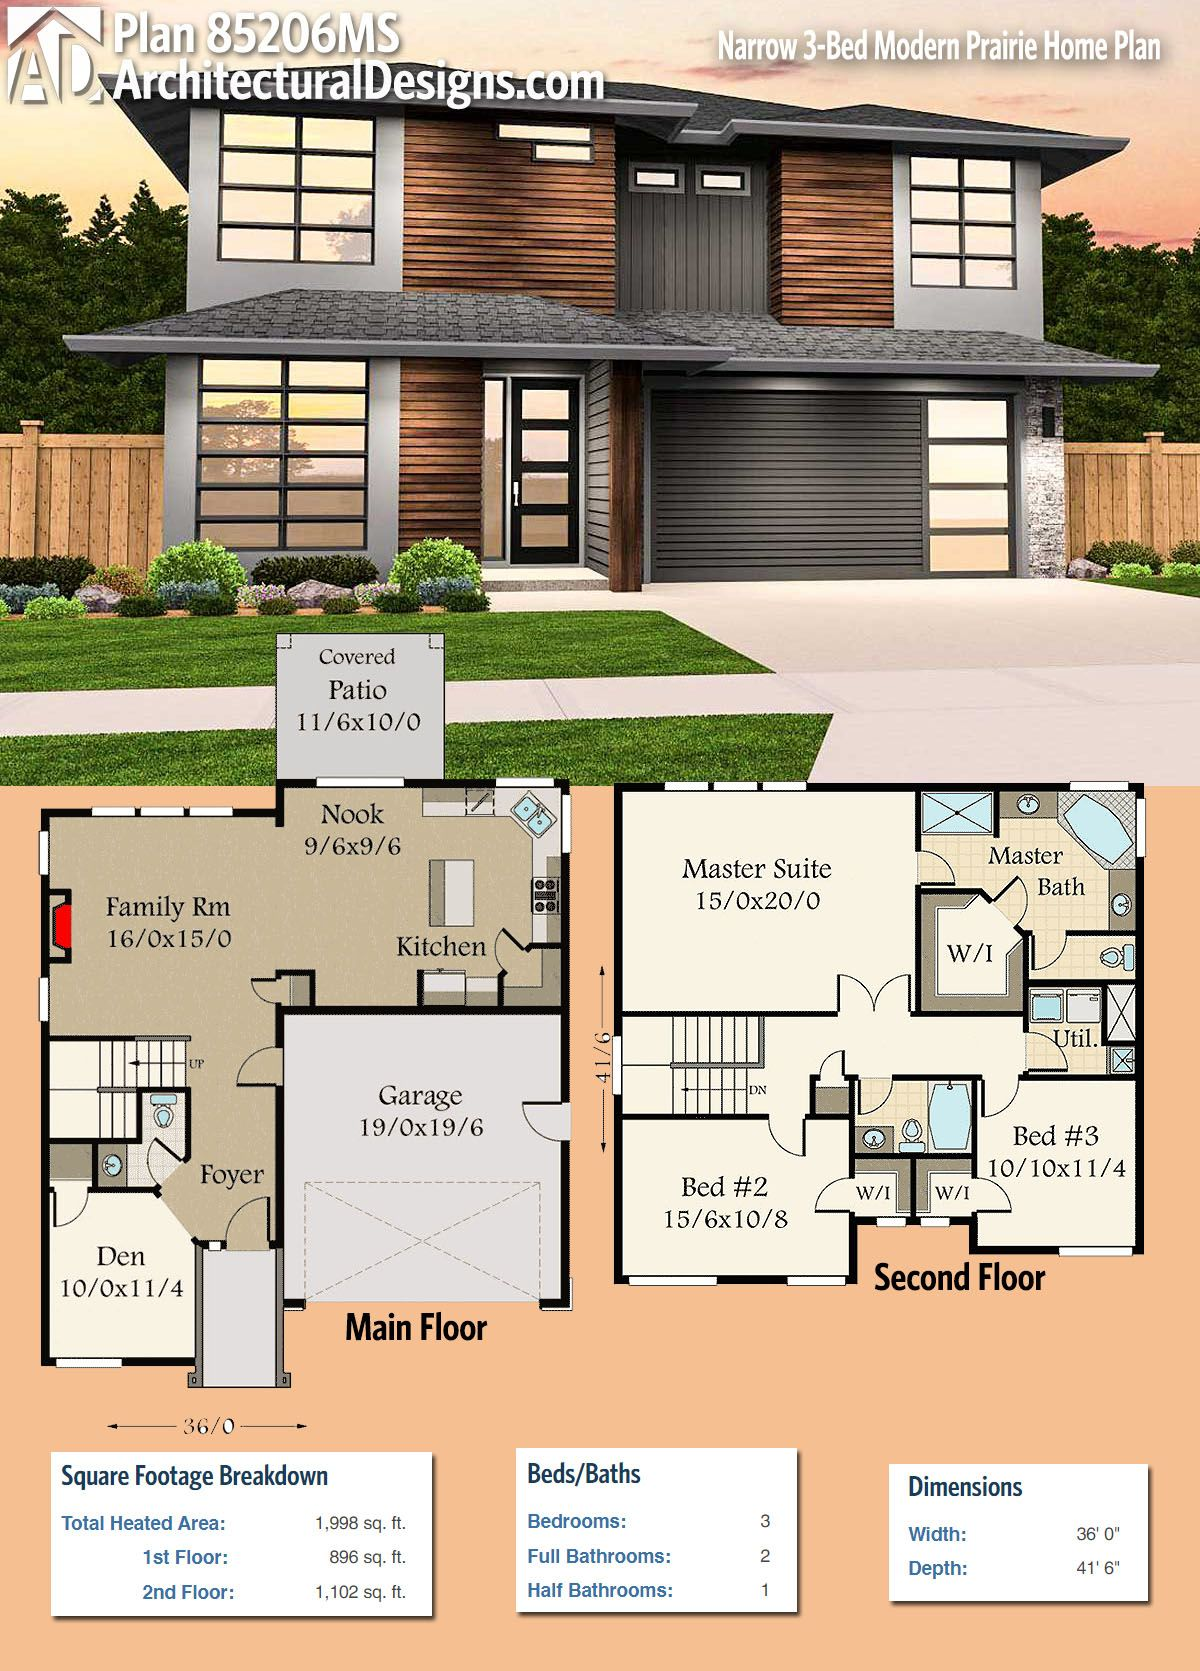 Plan 85206ms Narrow 3 Bed Modern Prairie Home Plan Modern Prairie Home Modern House Plans House Plans